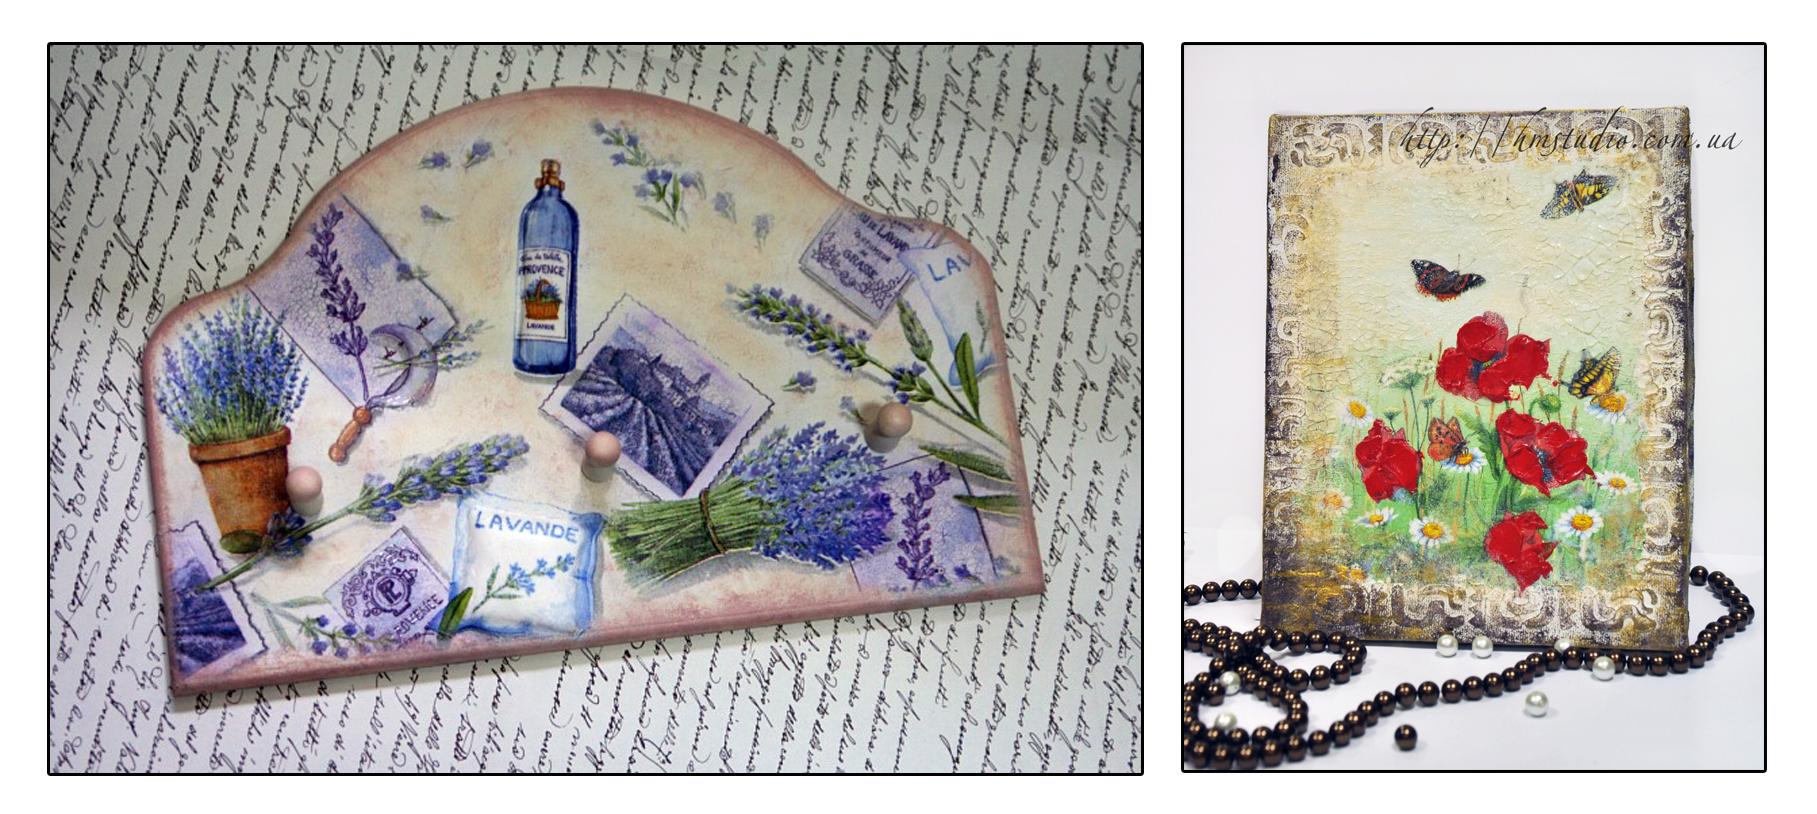 Картинки для декупажа домики с лавандой стенка стенку